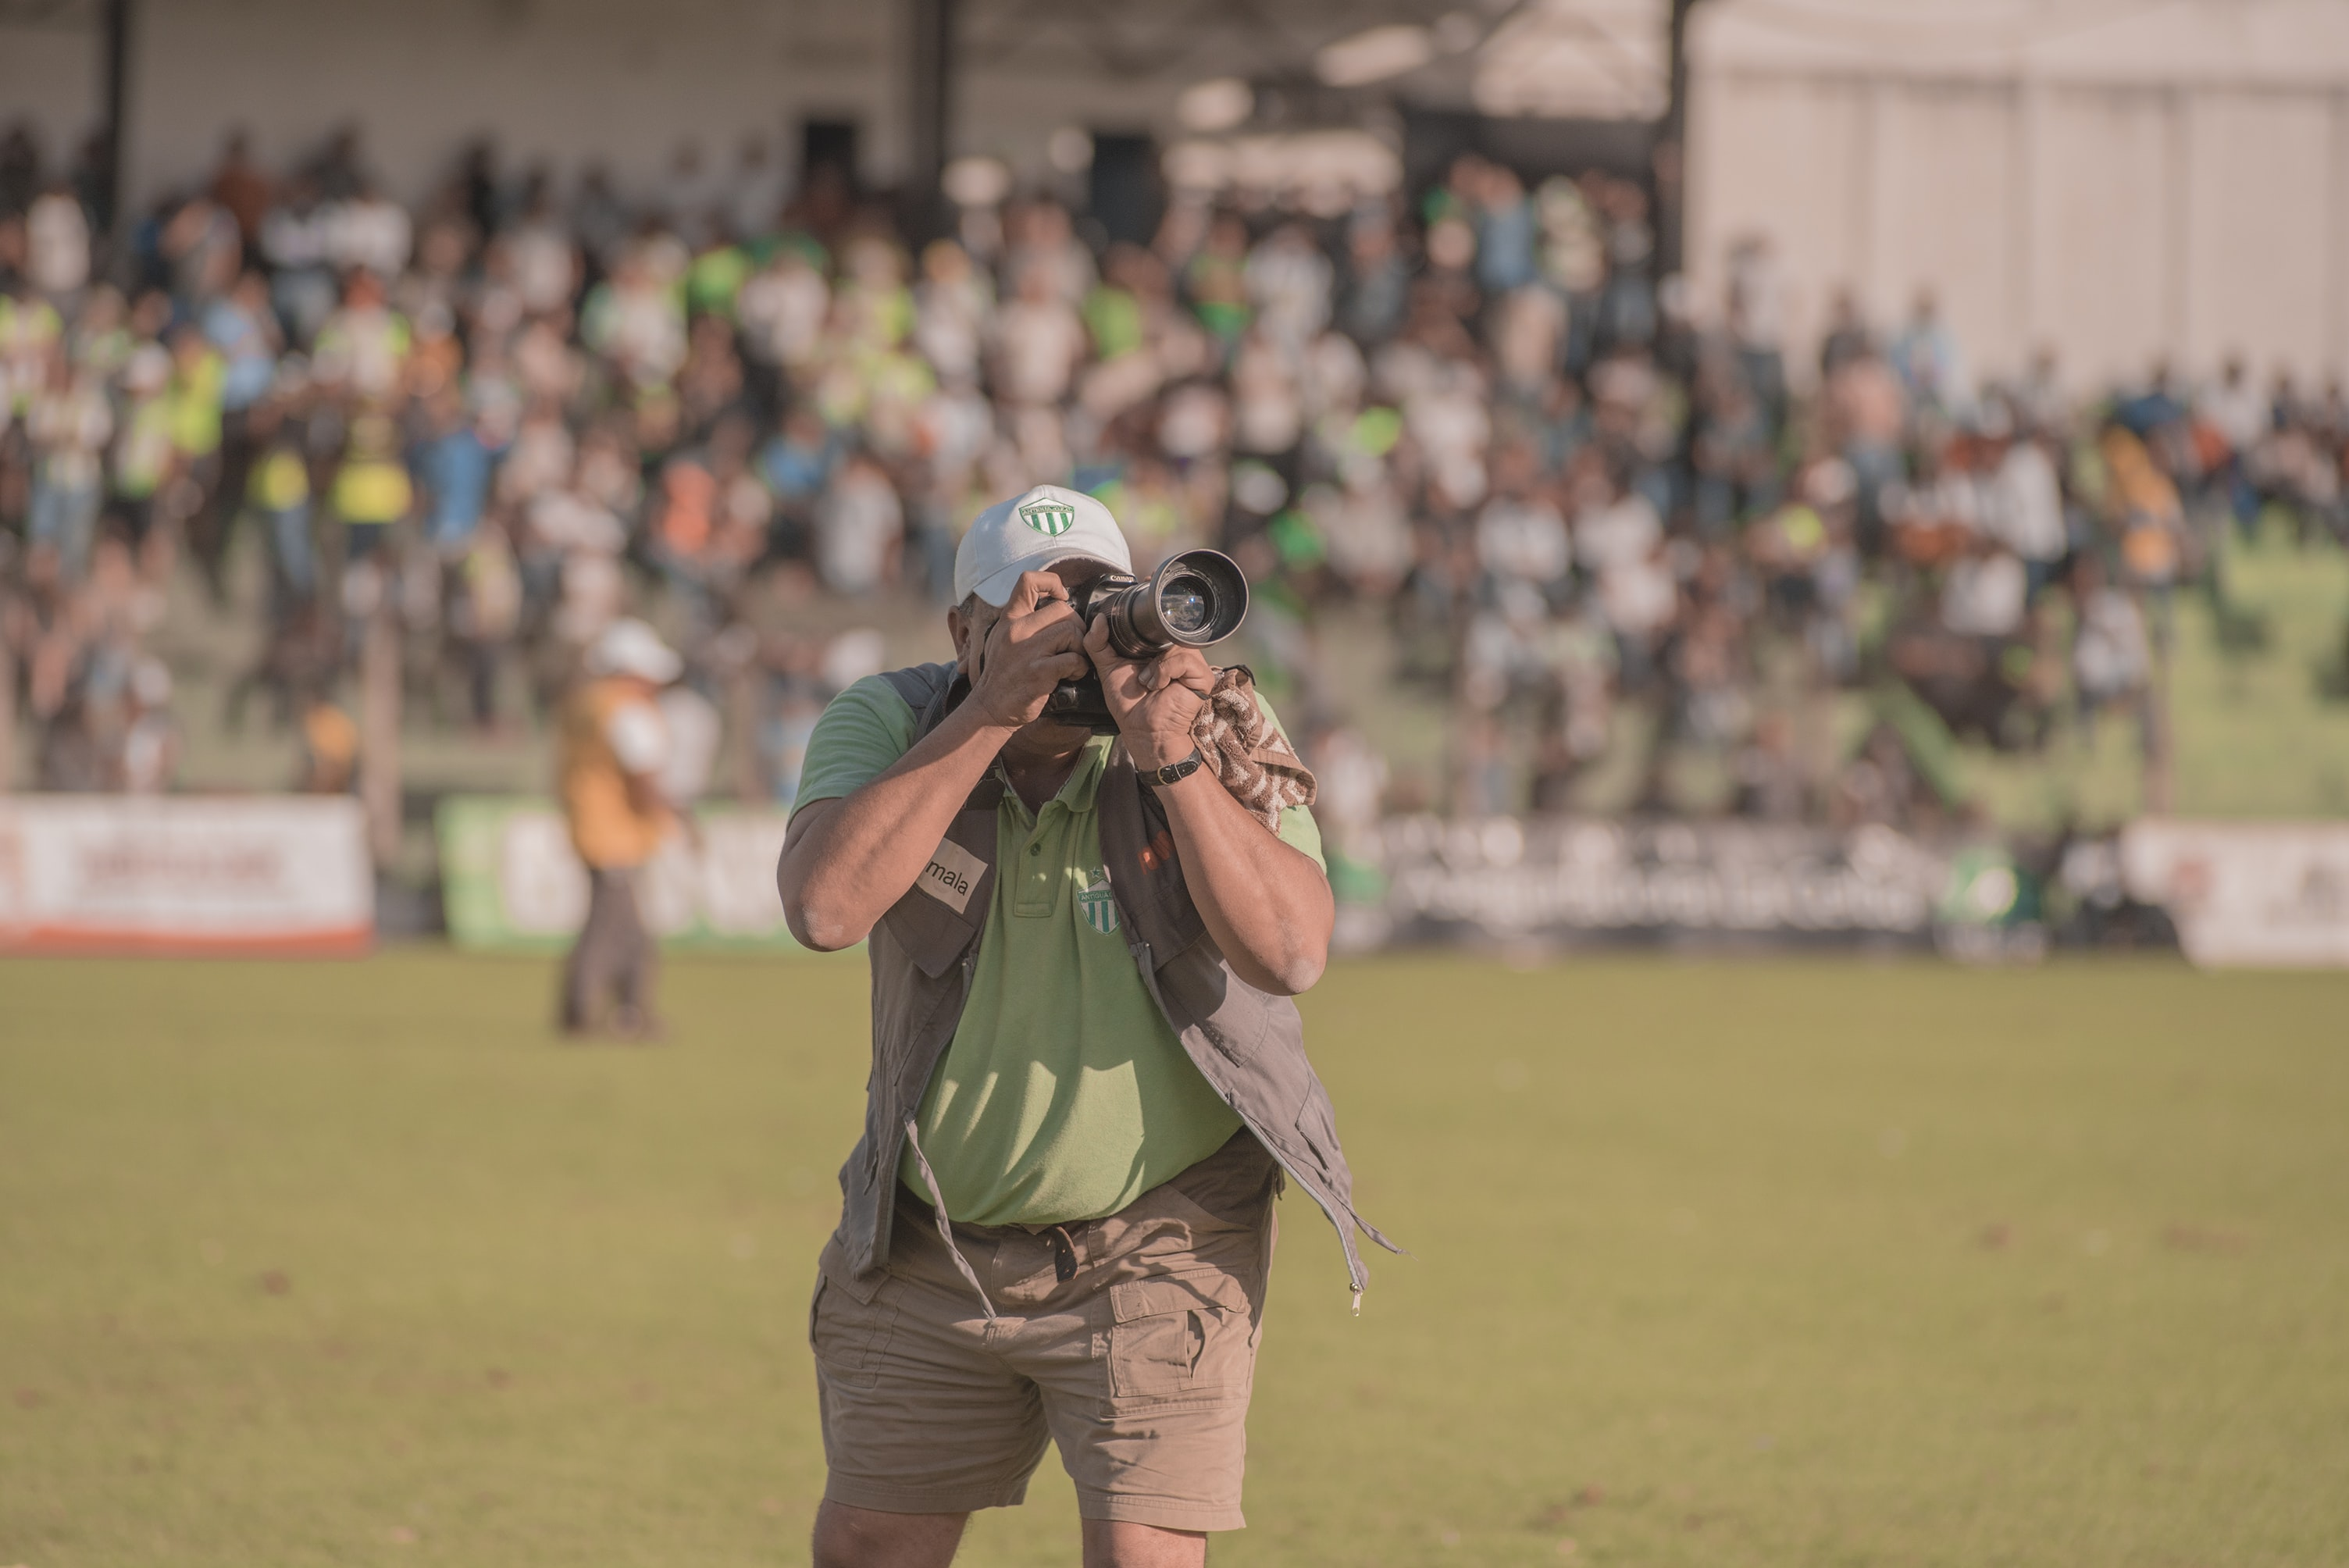 man holding camera near sports field